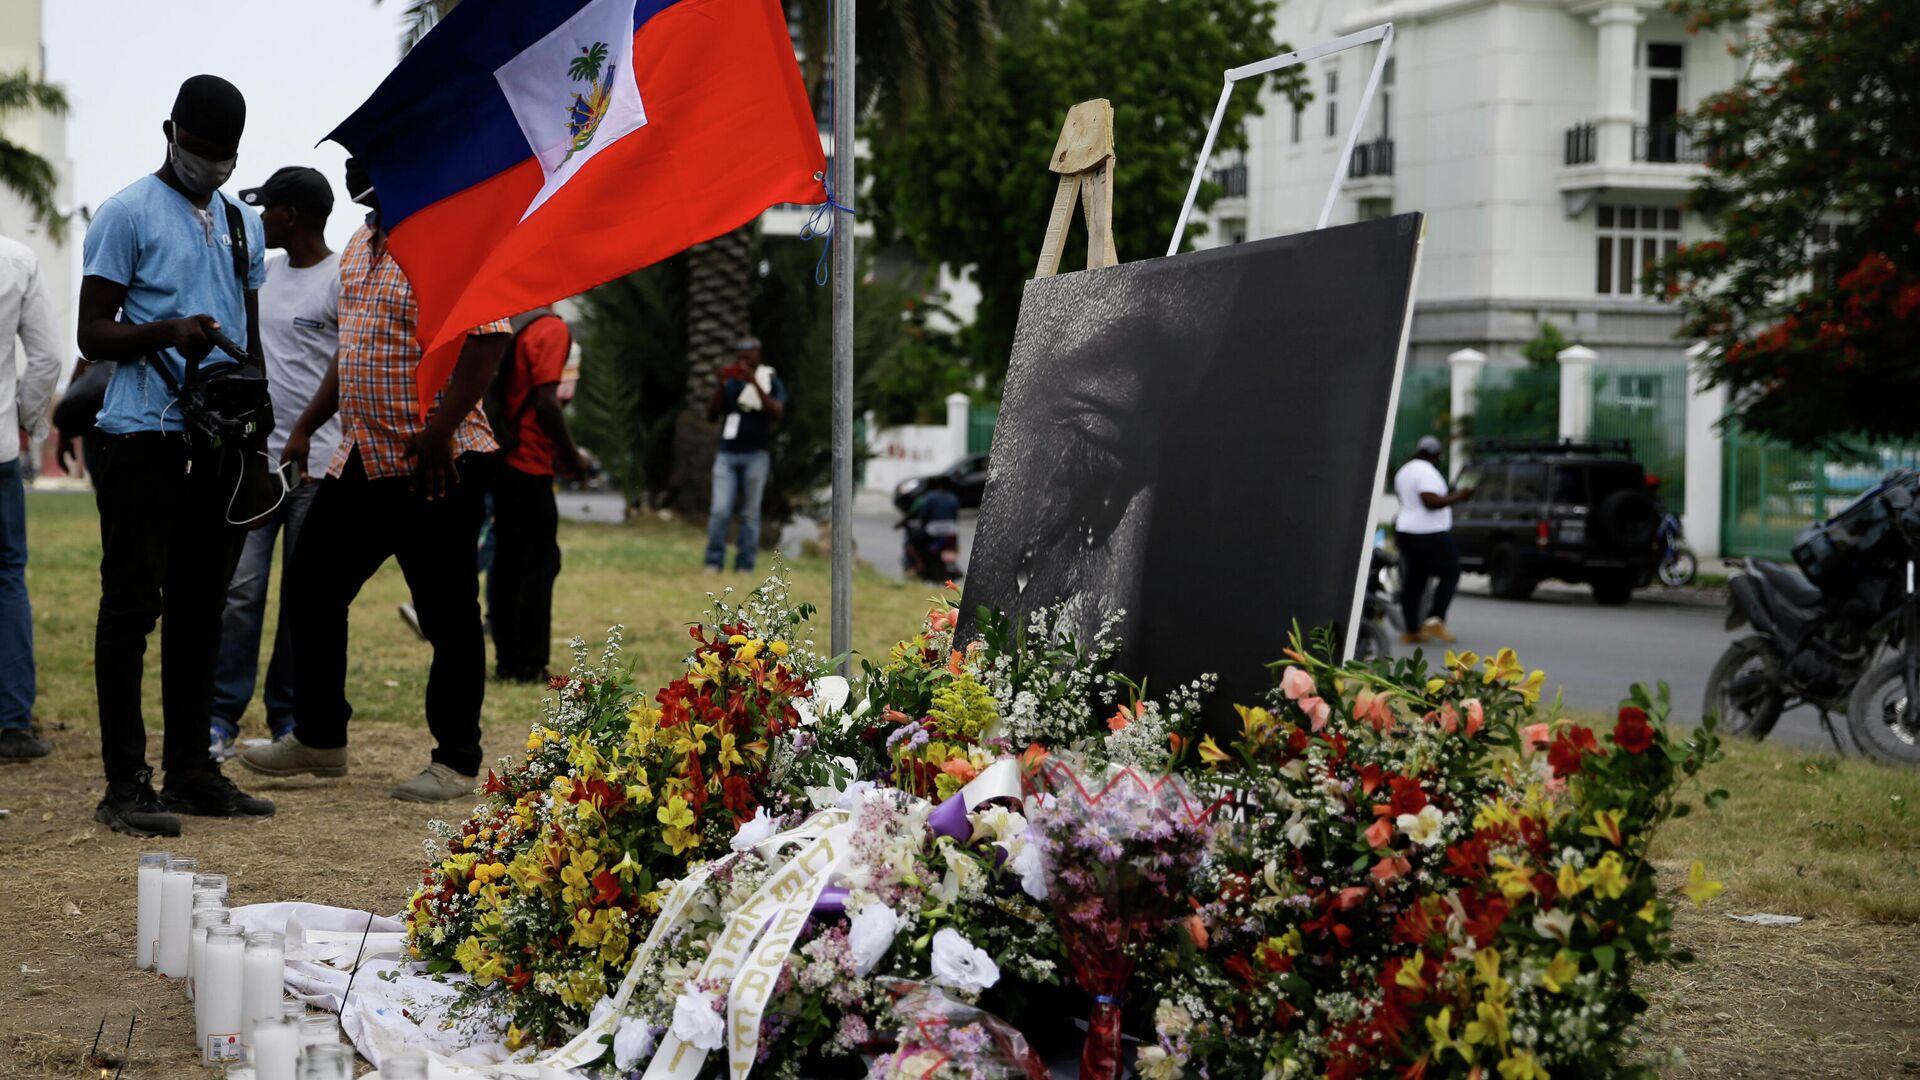 Homenaje al asesinado presidente de Haití, Jovenel Moise - Sputnik Mundo, 1920, 02.09.2021